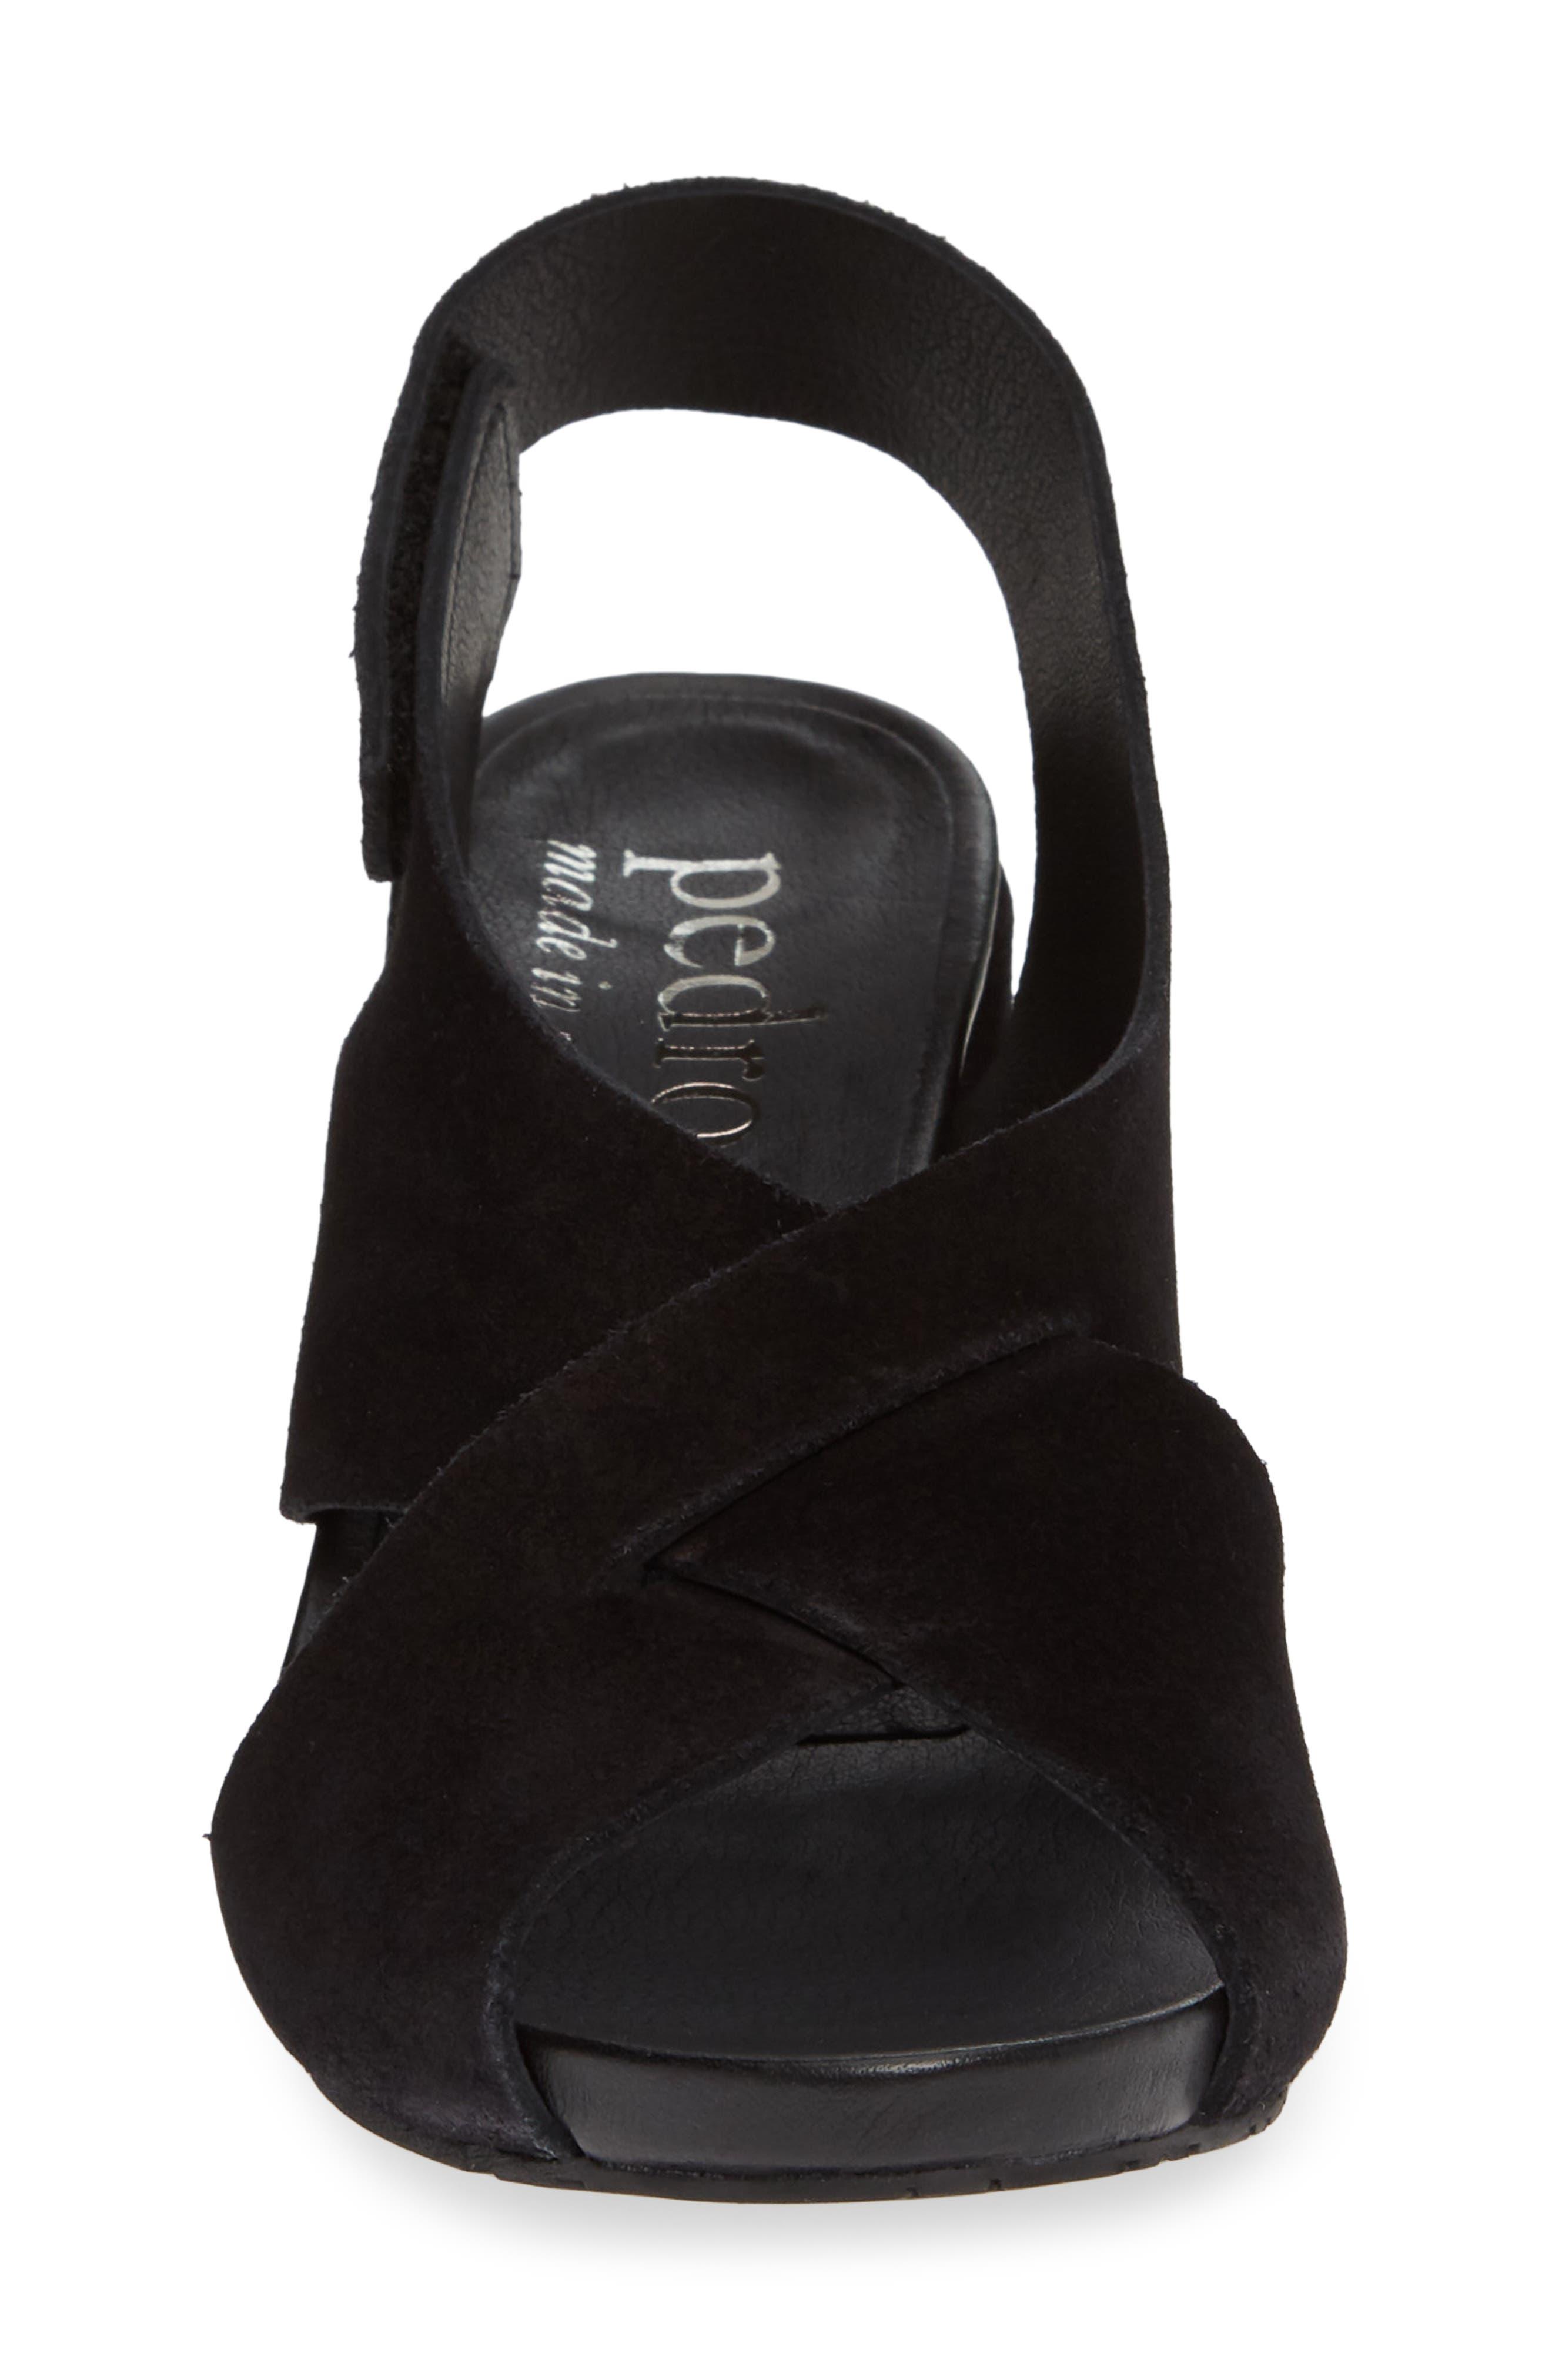 PEDRO GARCIA, Wiela Slingback Sandal, Alternate thumbnail 4, color, BLACK CASTORO